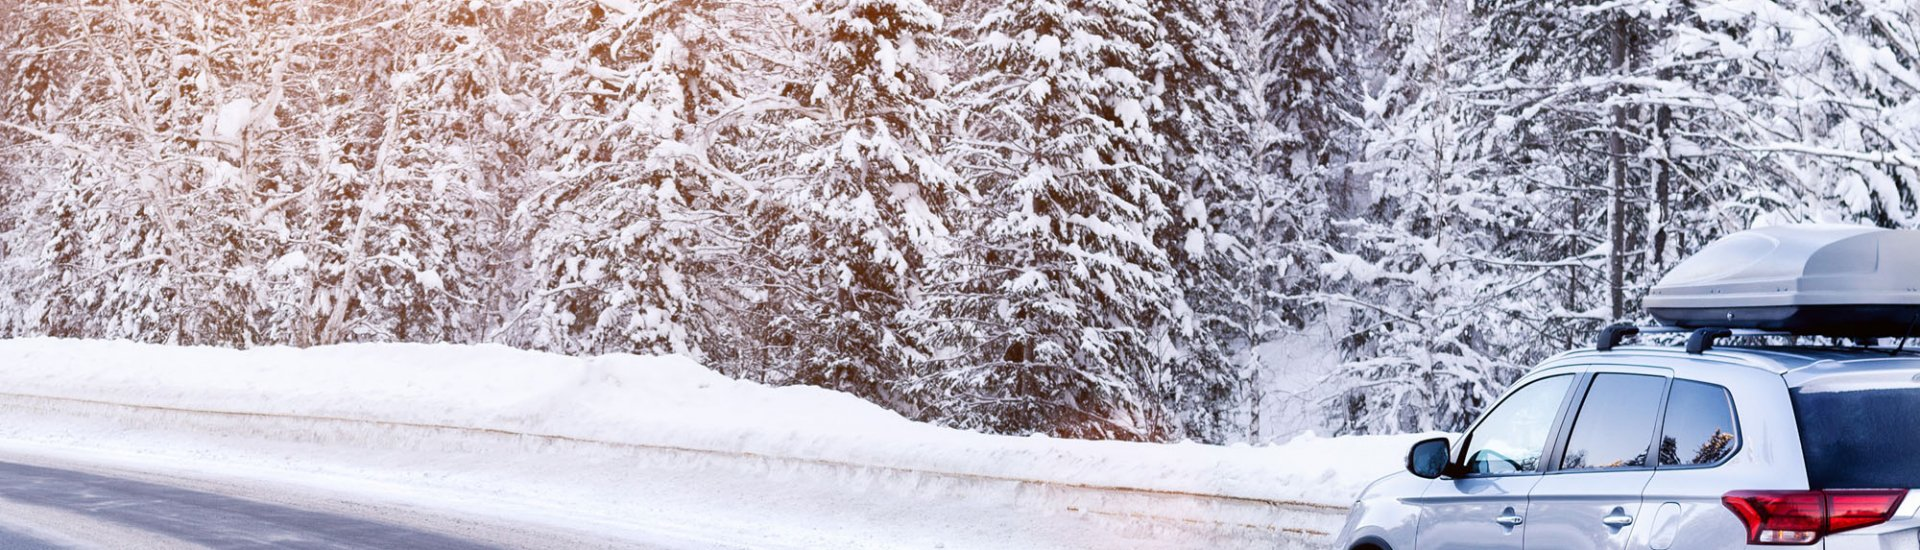 Pirelli Winterreifen: Top 3 Modelle, Kaufberatung